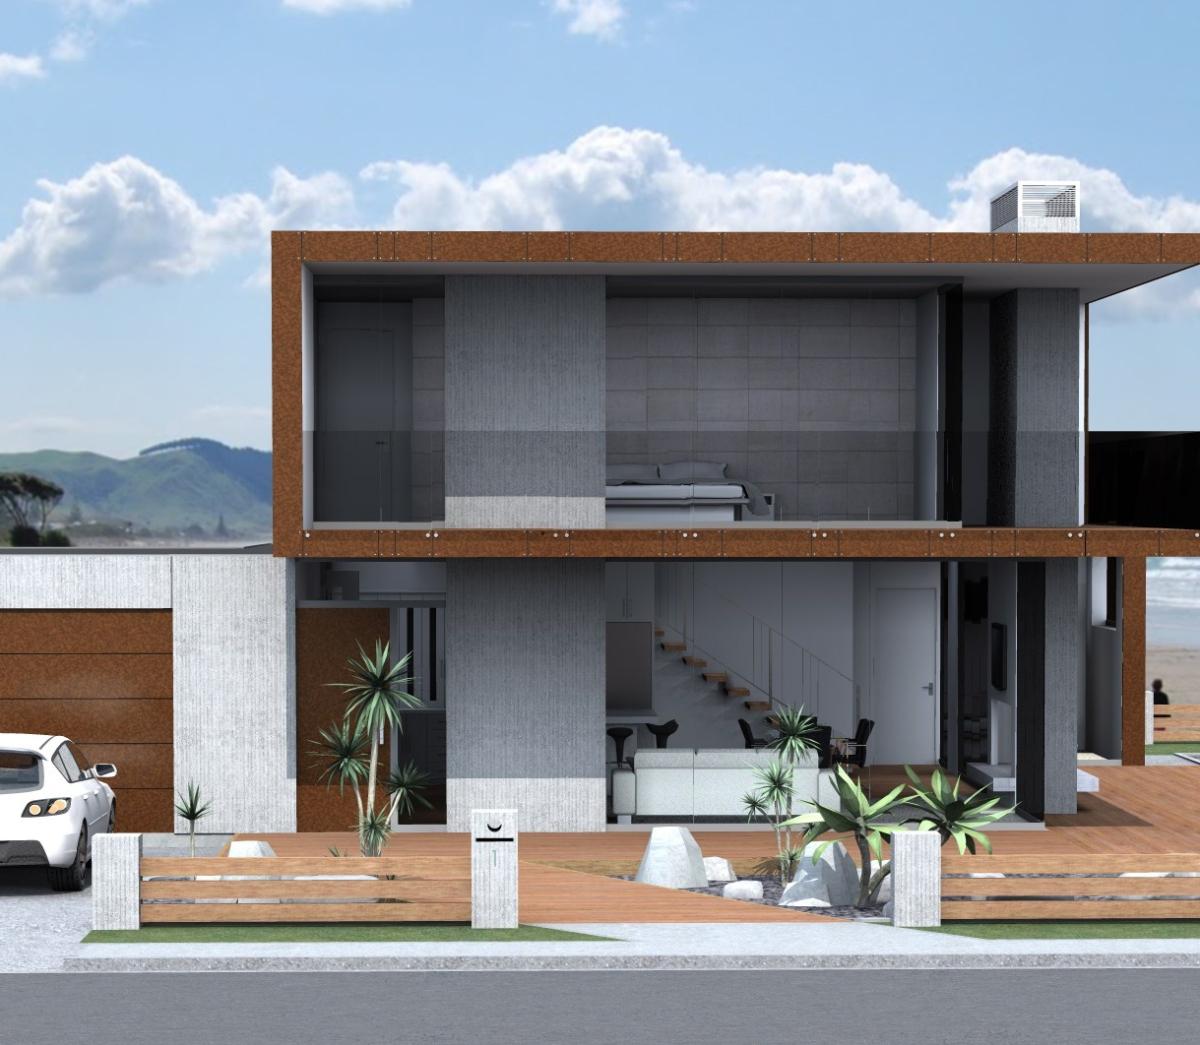 bk design architectural designers a1 bkdesignconz architectural draftsperson architectural draftsperson